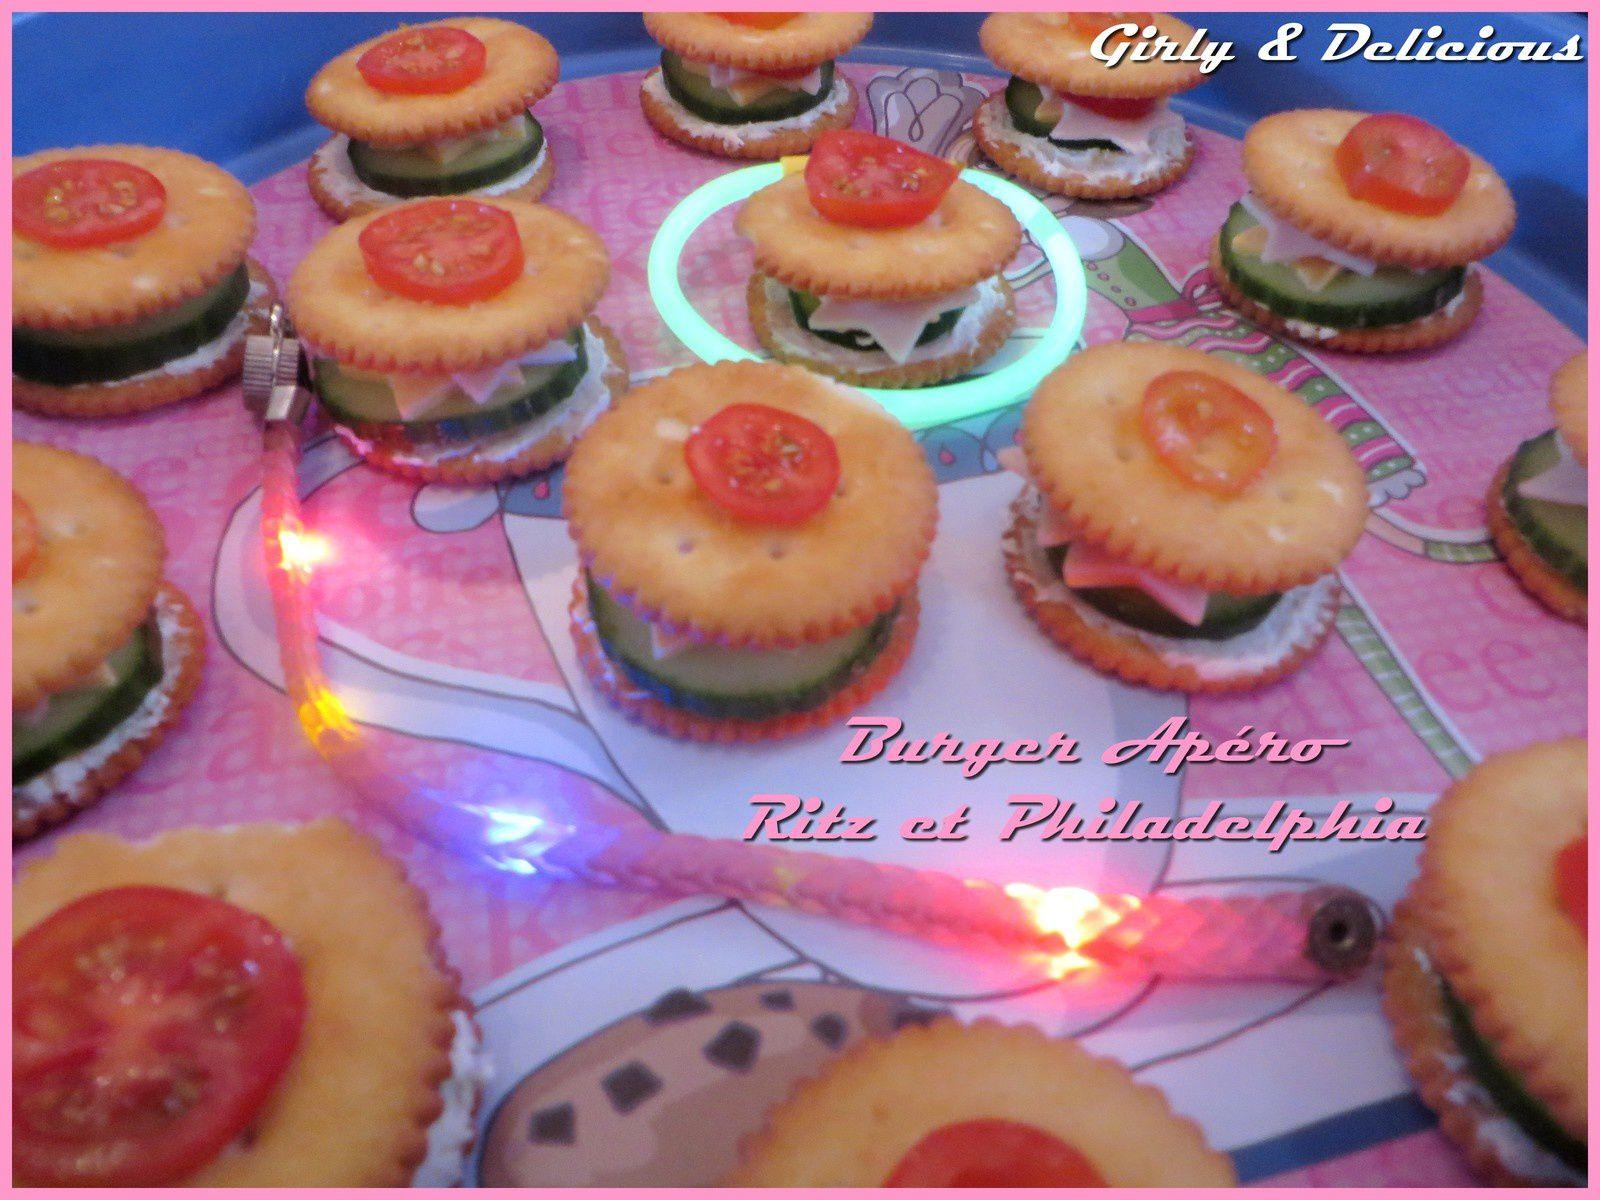 Burger Apéro Ritz et Philadelphia